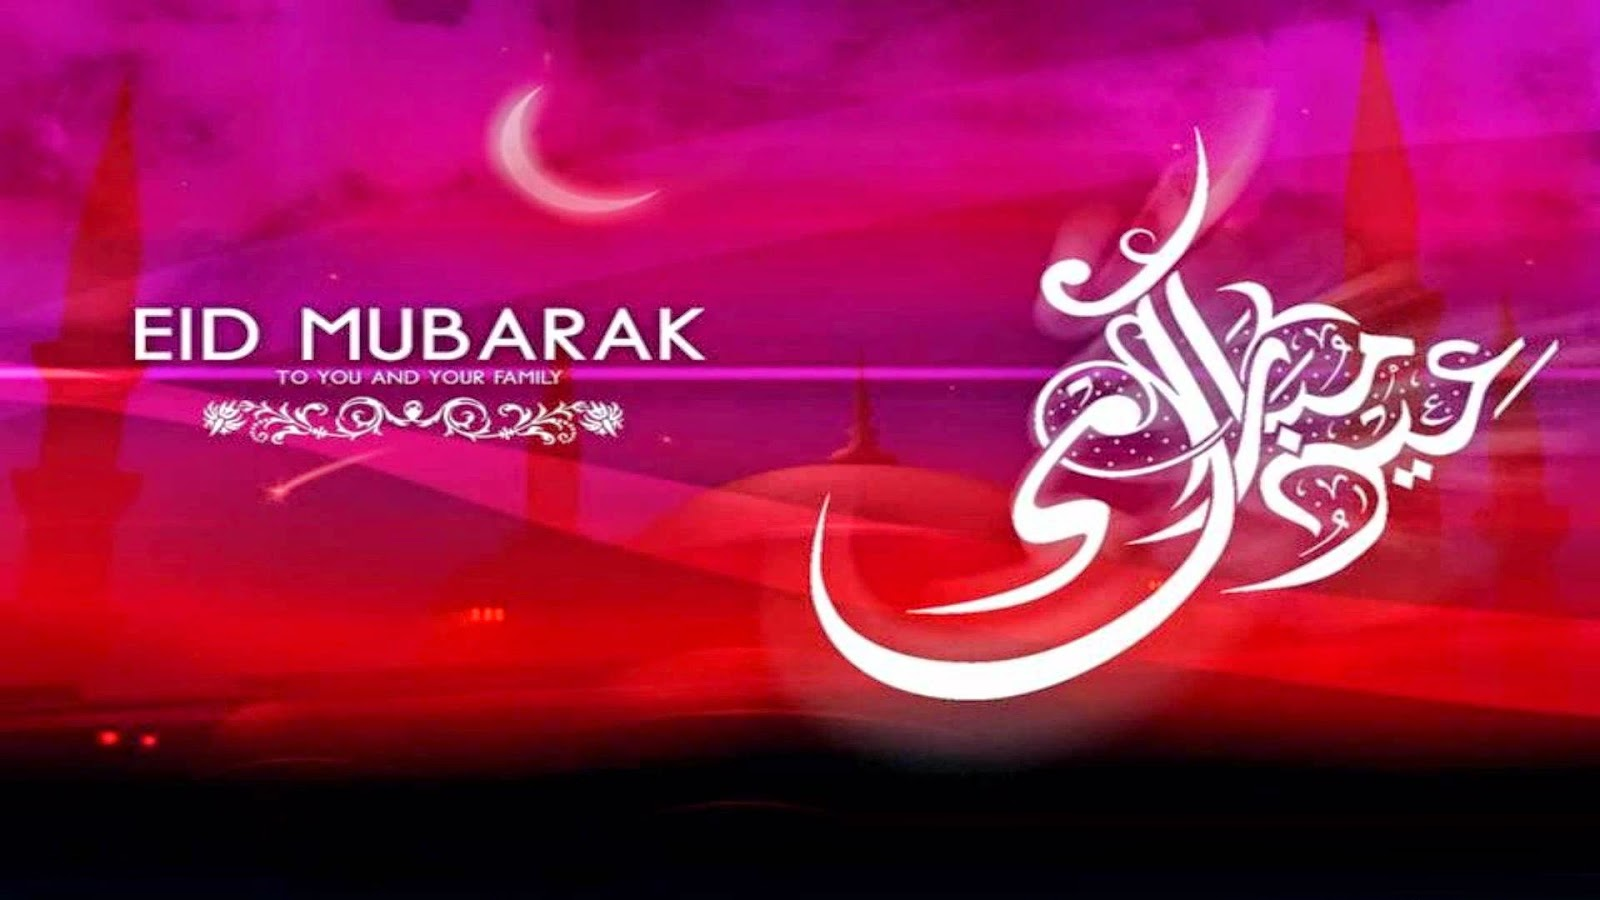 TitleEid Mubarak 2014